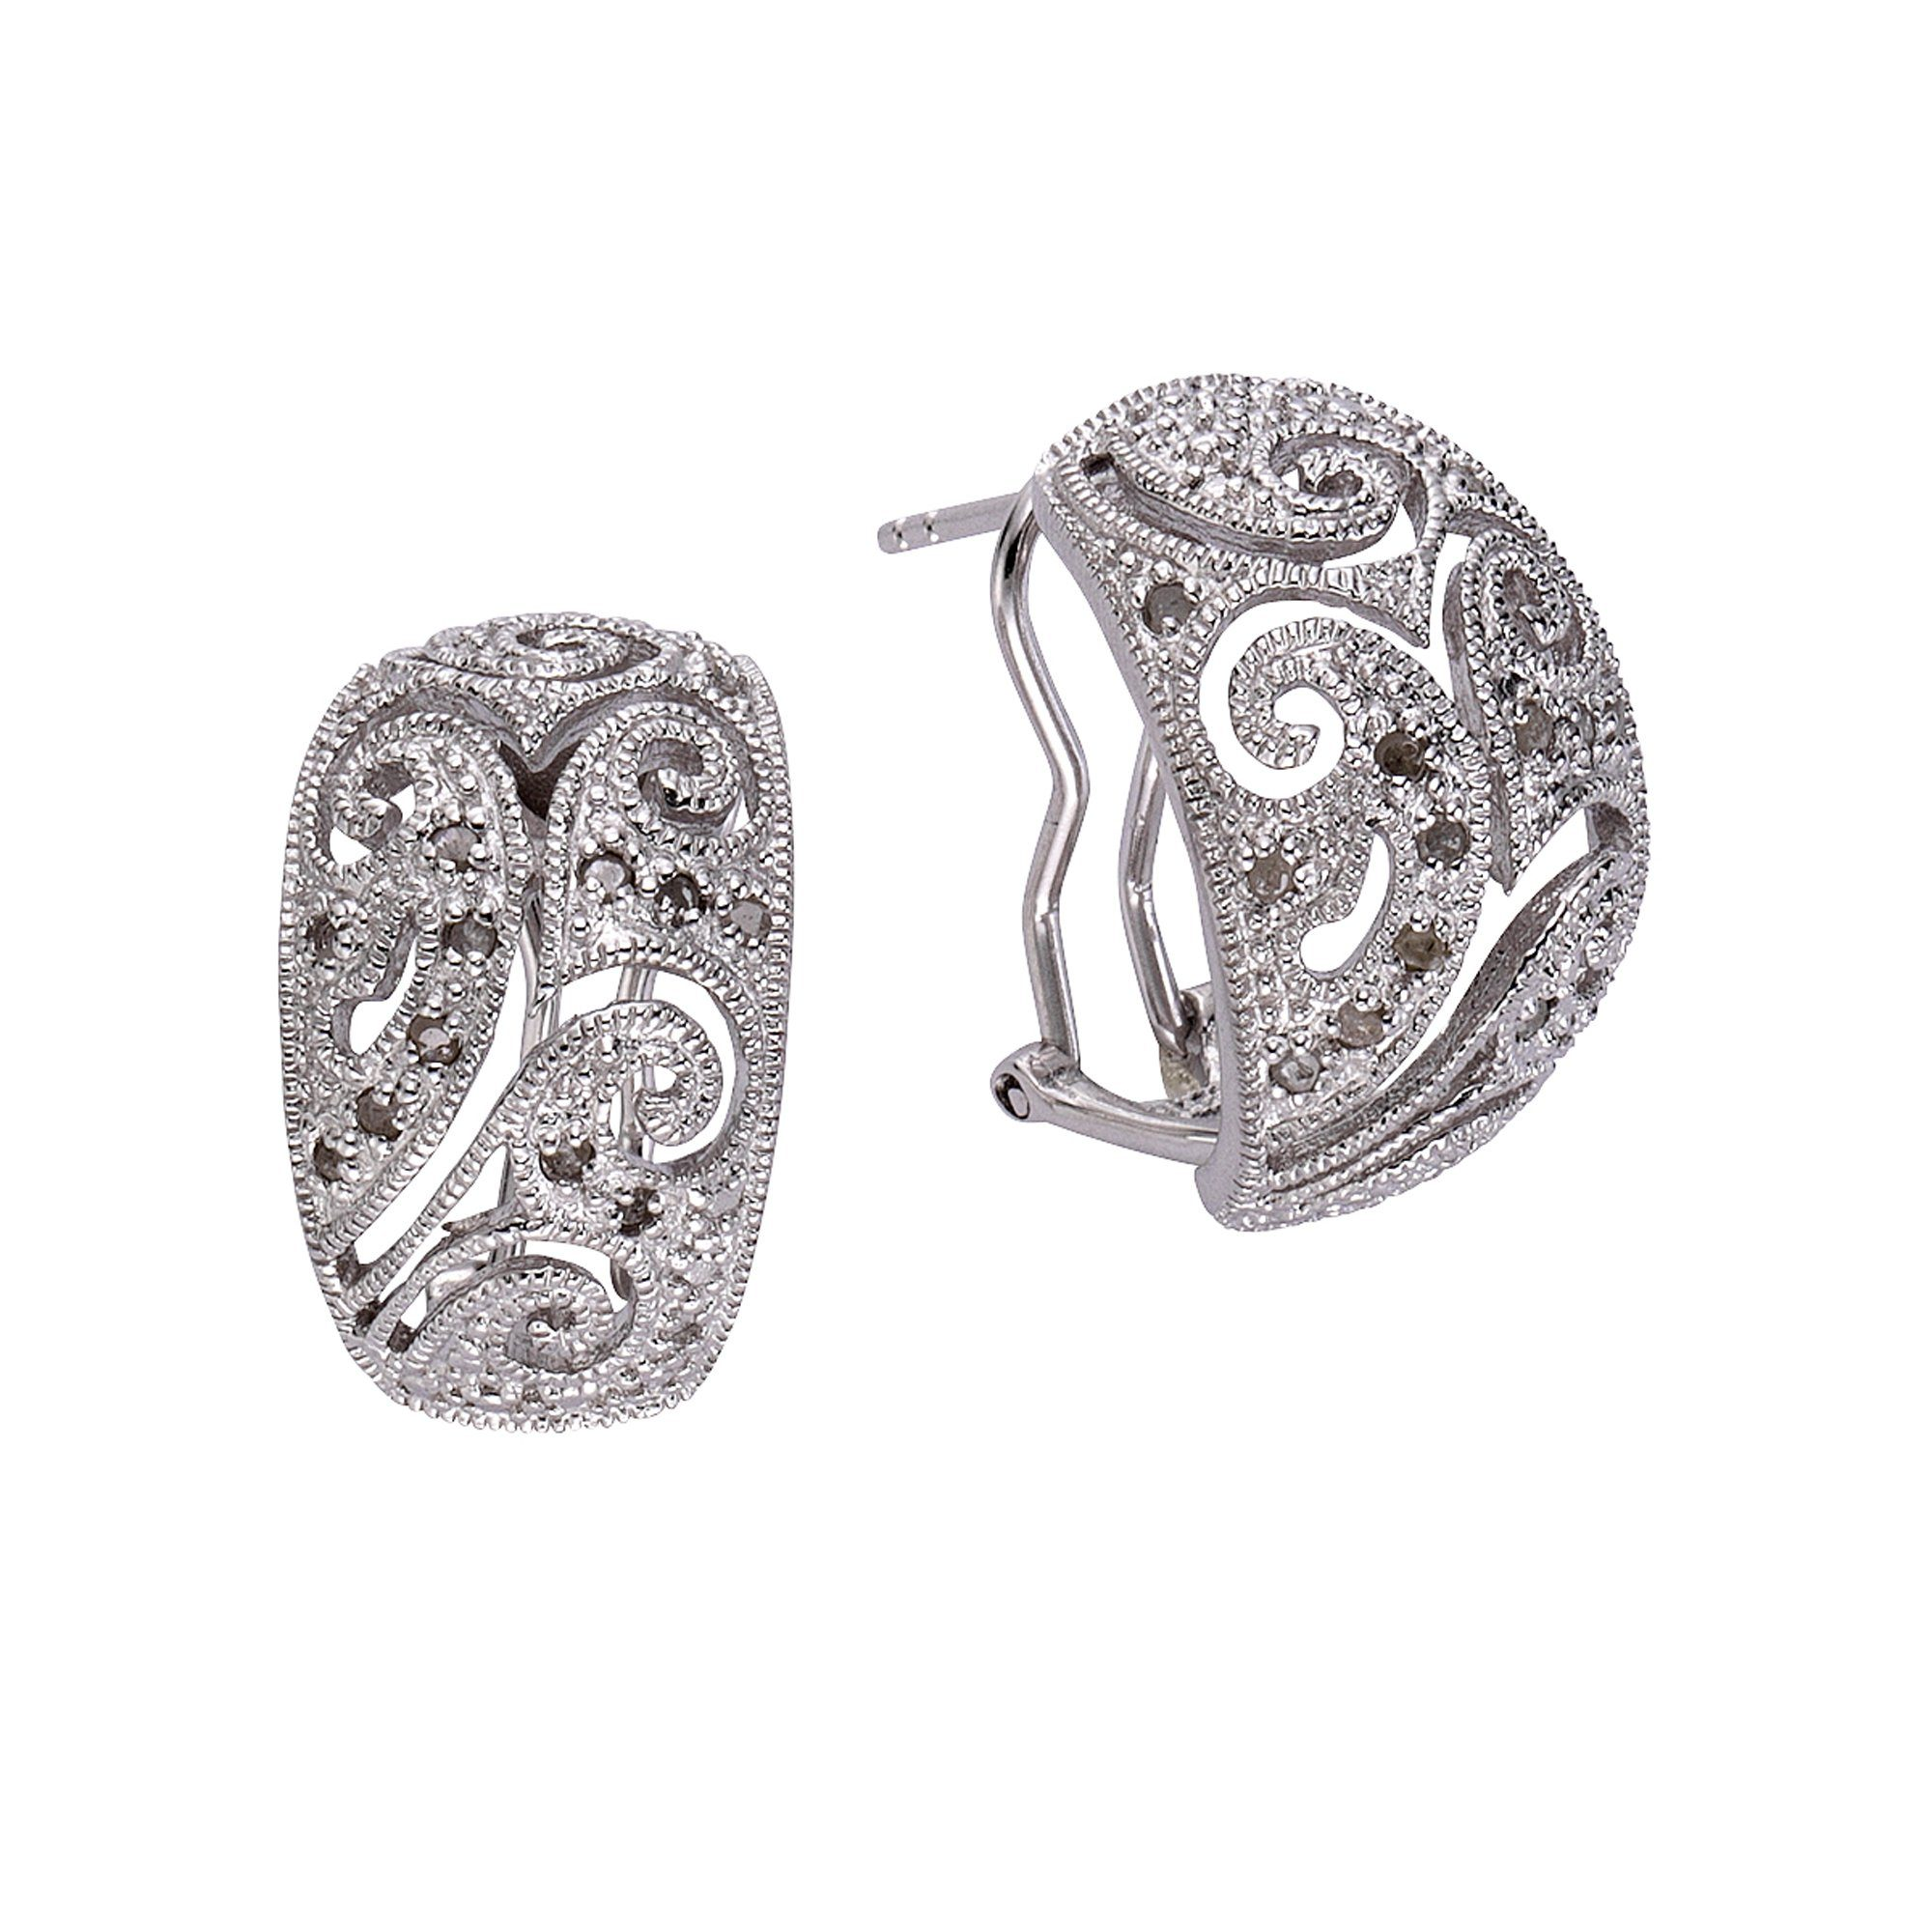 Diamonds by Ellen K Ohrstecker 925/- Sterling Silber Diamant 026ct | Schmuck > Ohrschmuck & Ohrringe > Ohrstecker | Weiß | Diamonds By Ellen K.